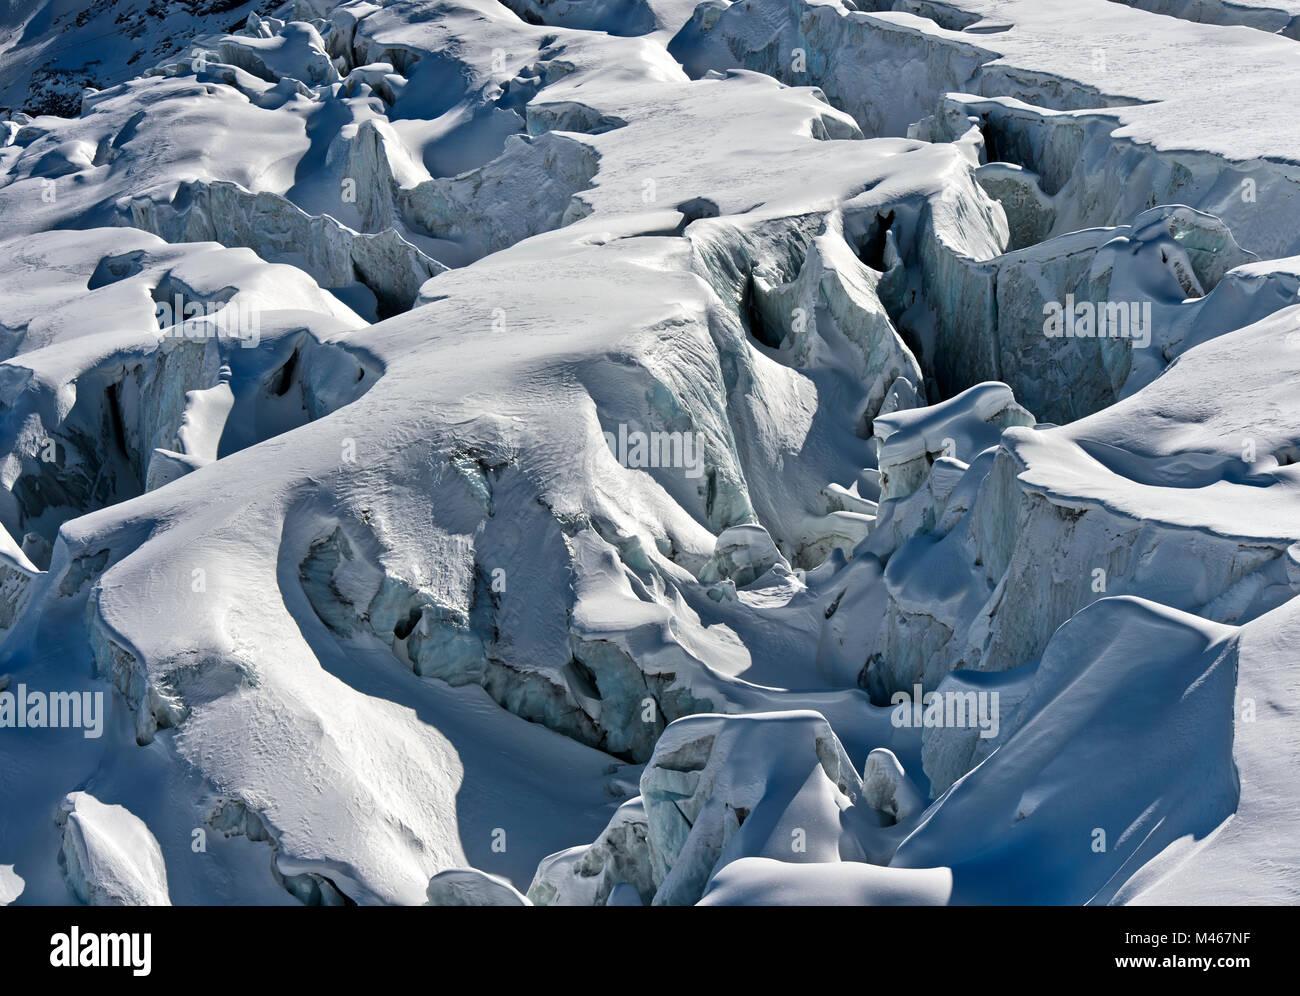 Crepacci del ghiacciaio Feegletscher, Saas fee, Vallese, Svizzera Immagini Stock